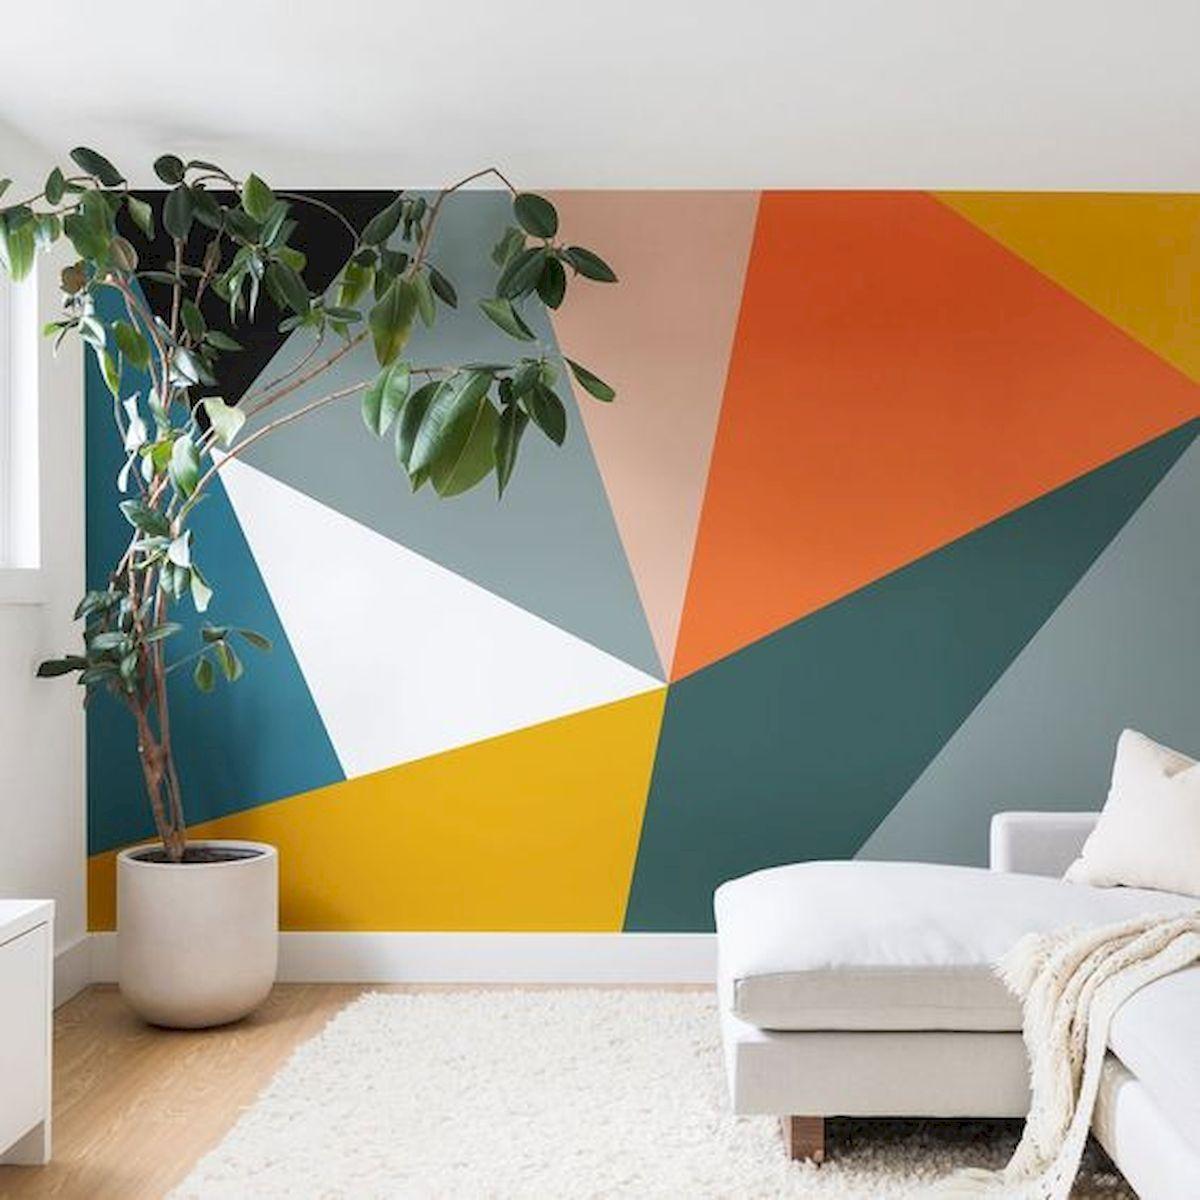 33 Best Geometric Wall Art Paint Design Ideas33decor Bedroom Wall Paint Diy Wall Painting Room Wall Painting